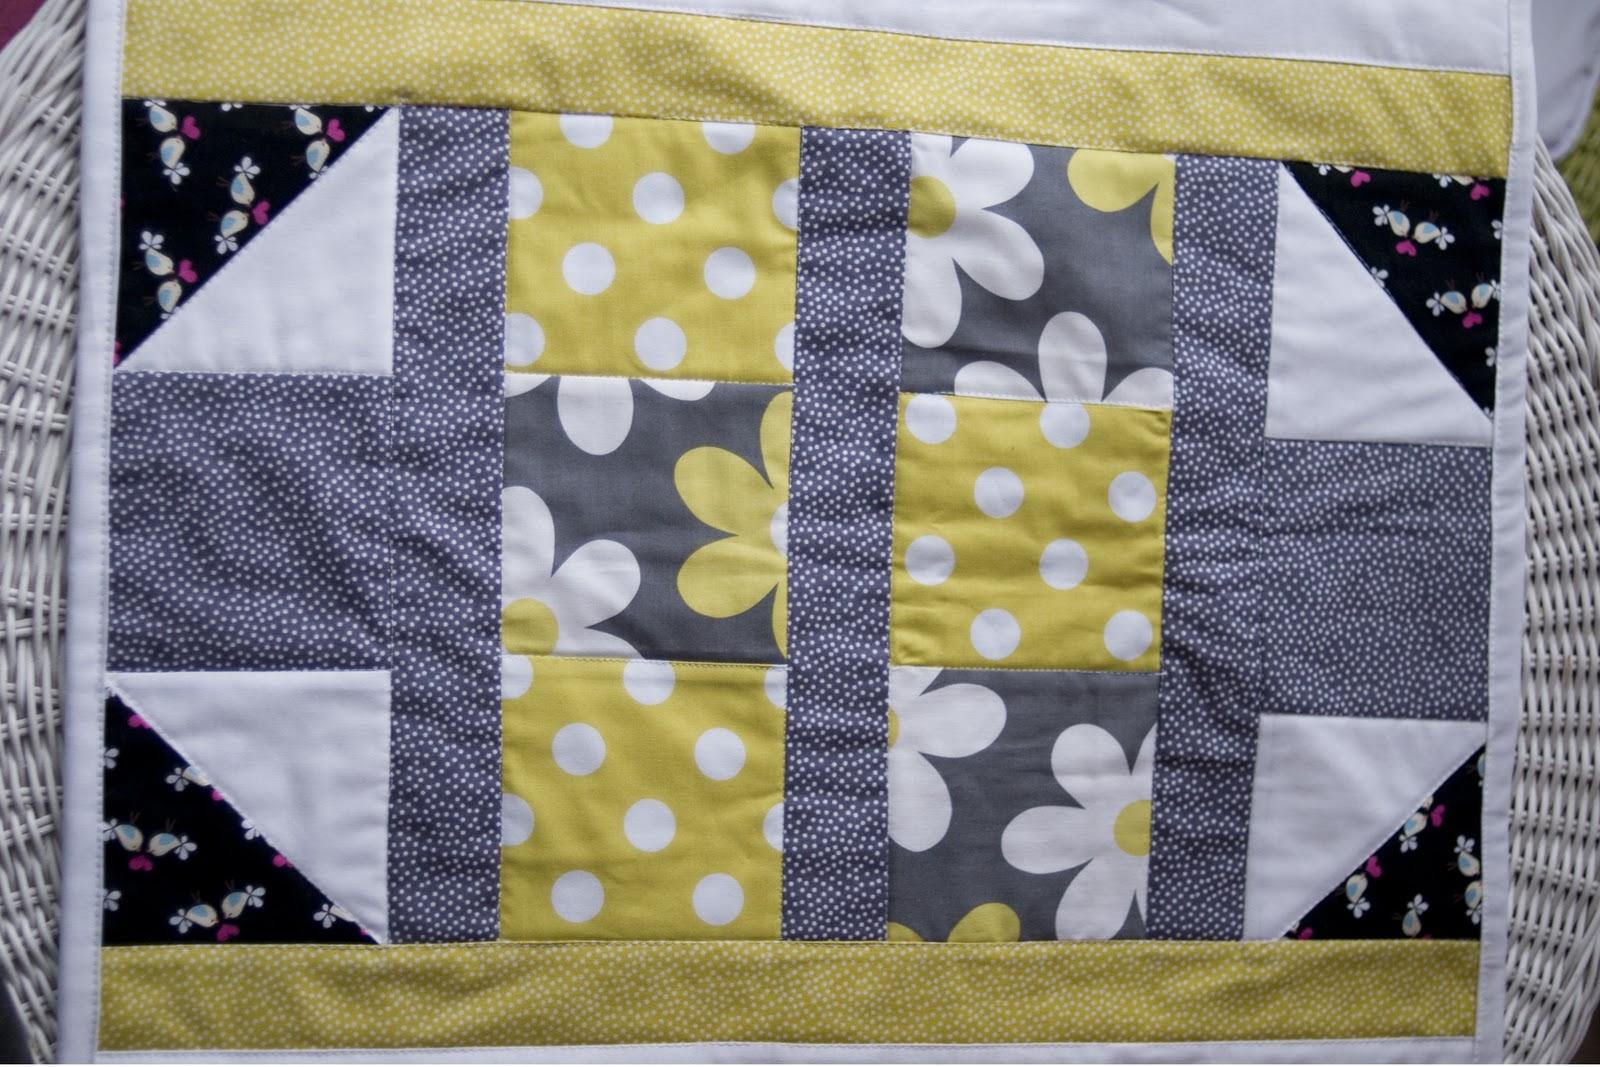 Fabric Doll Mini Quilt The Polka Dot Chair